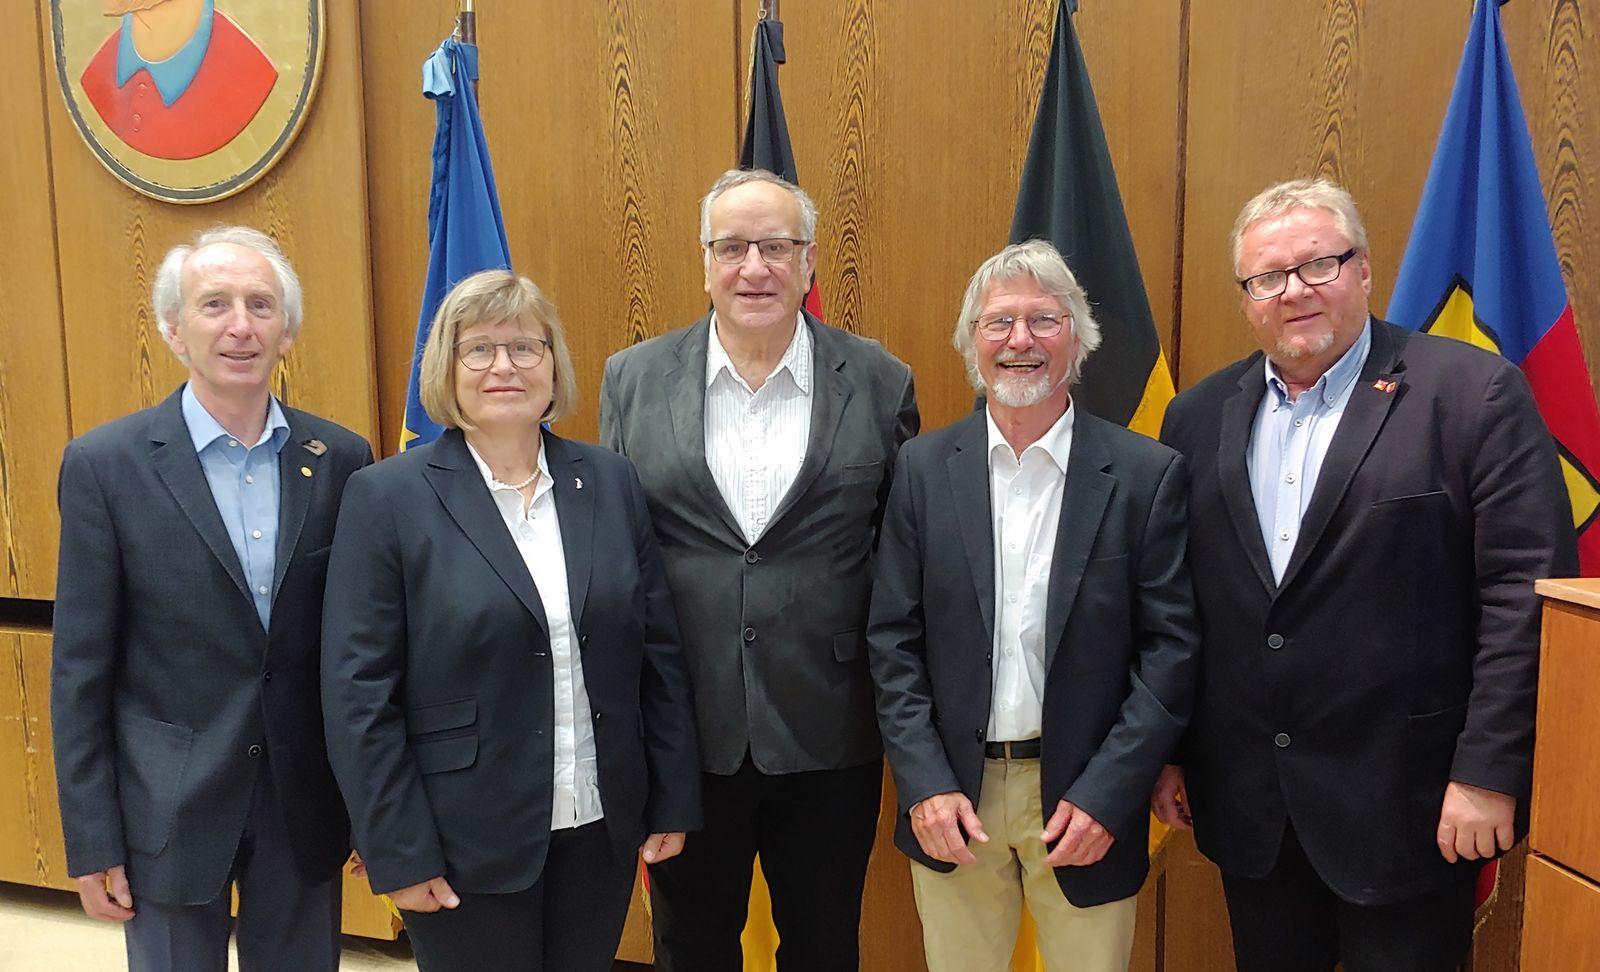 Verabschiedung der SPD-Stadträte am 25.06.2019